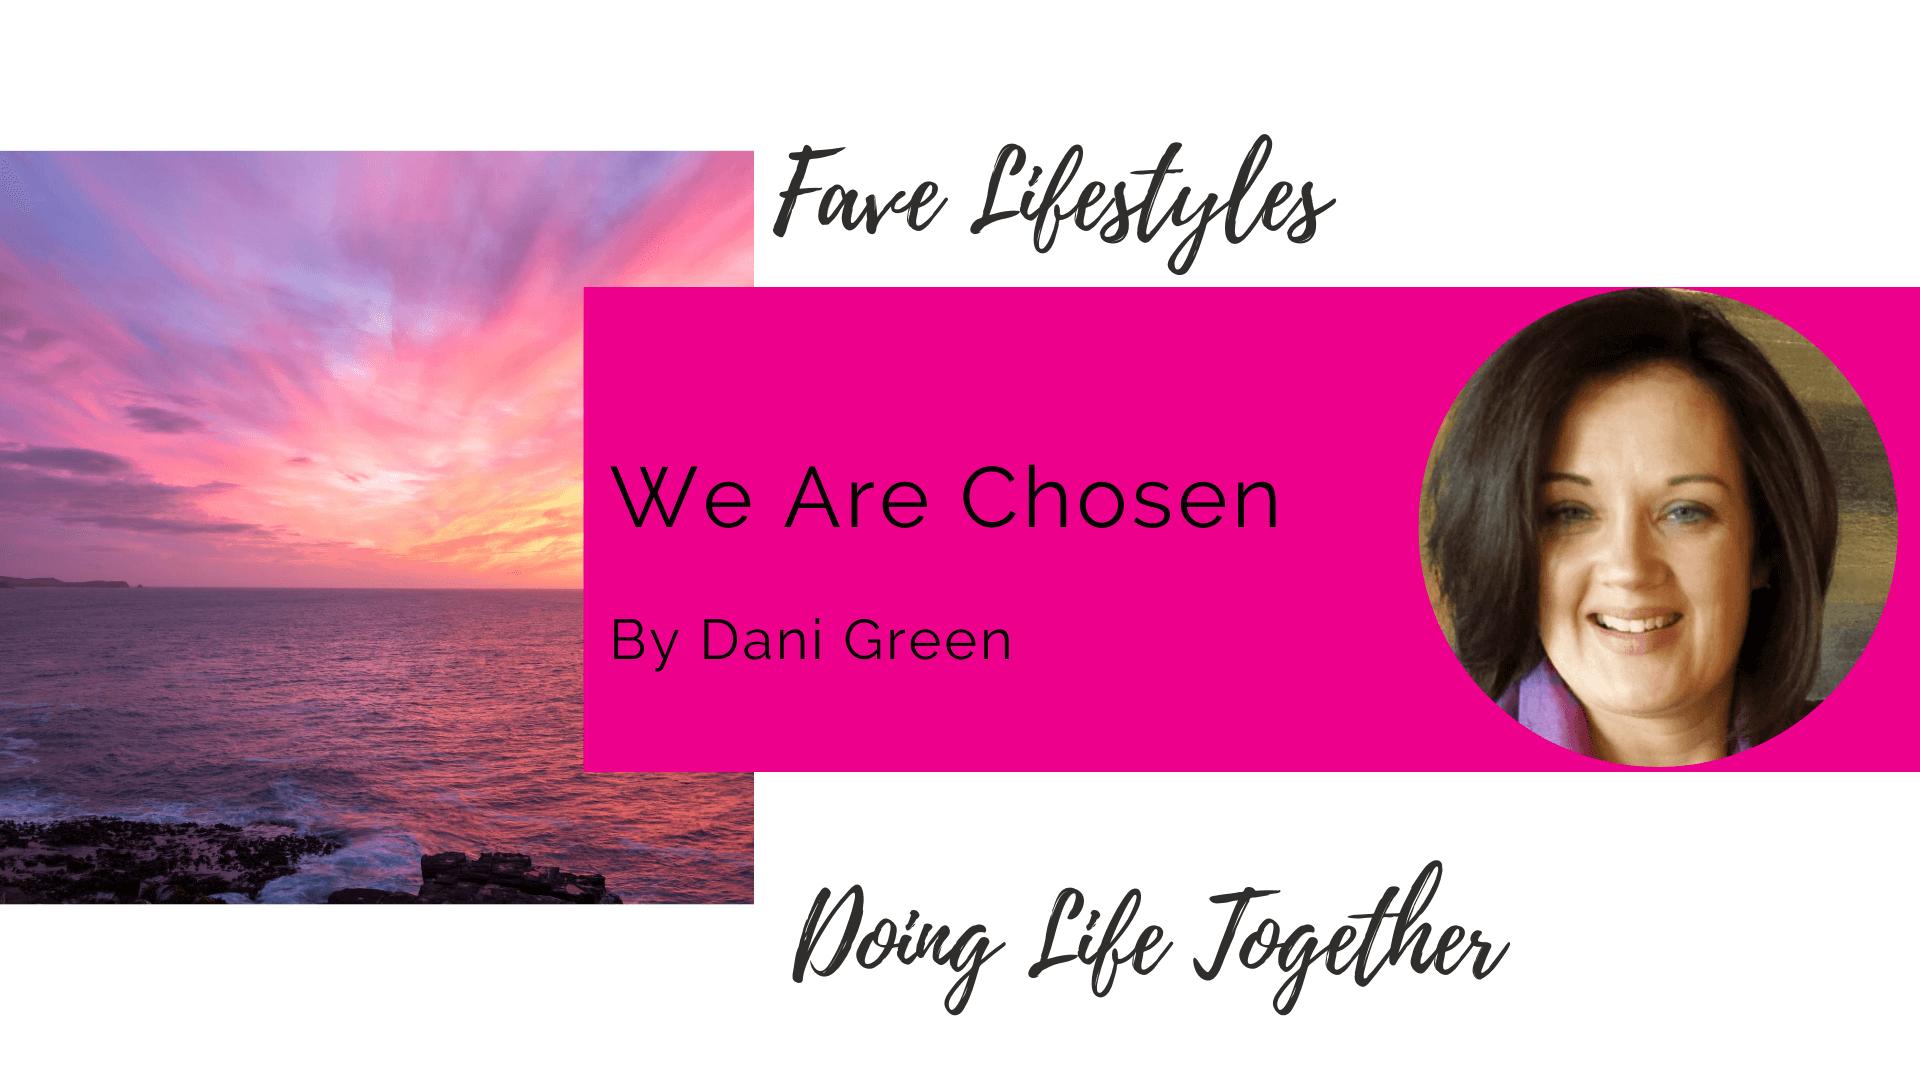 We Are Chosen